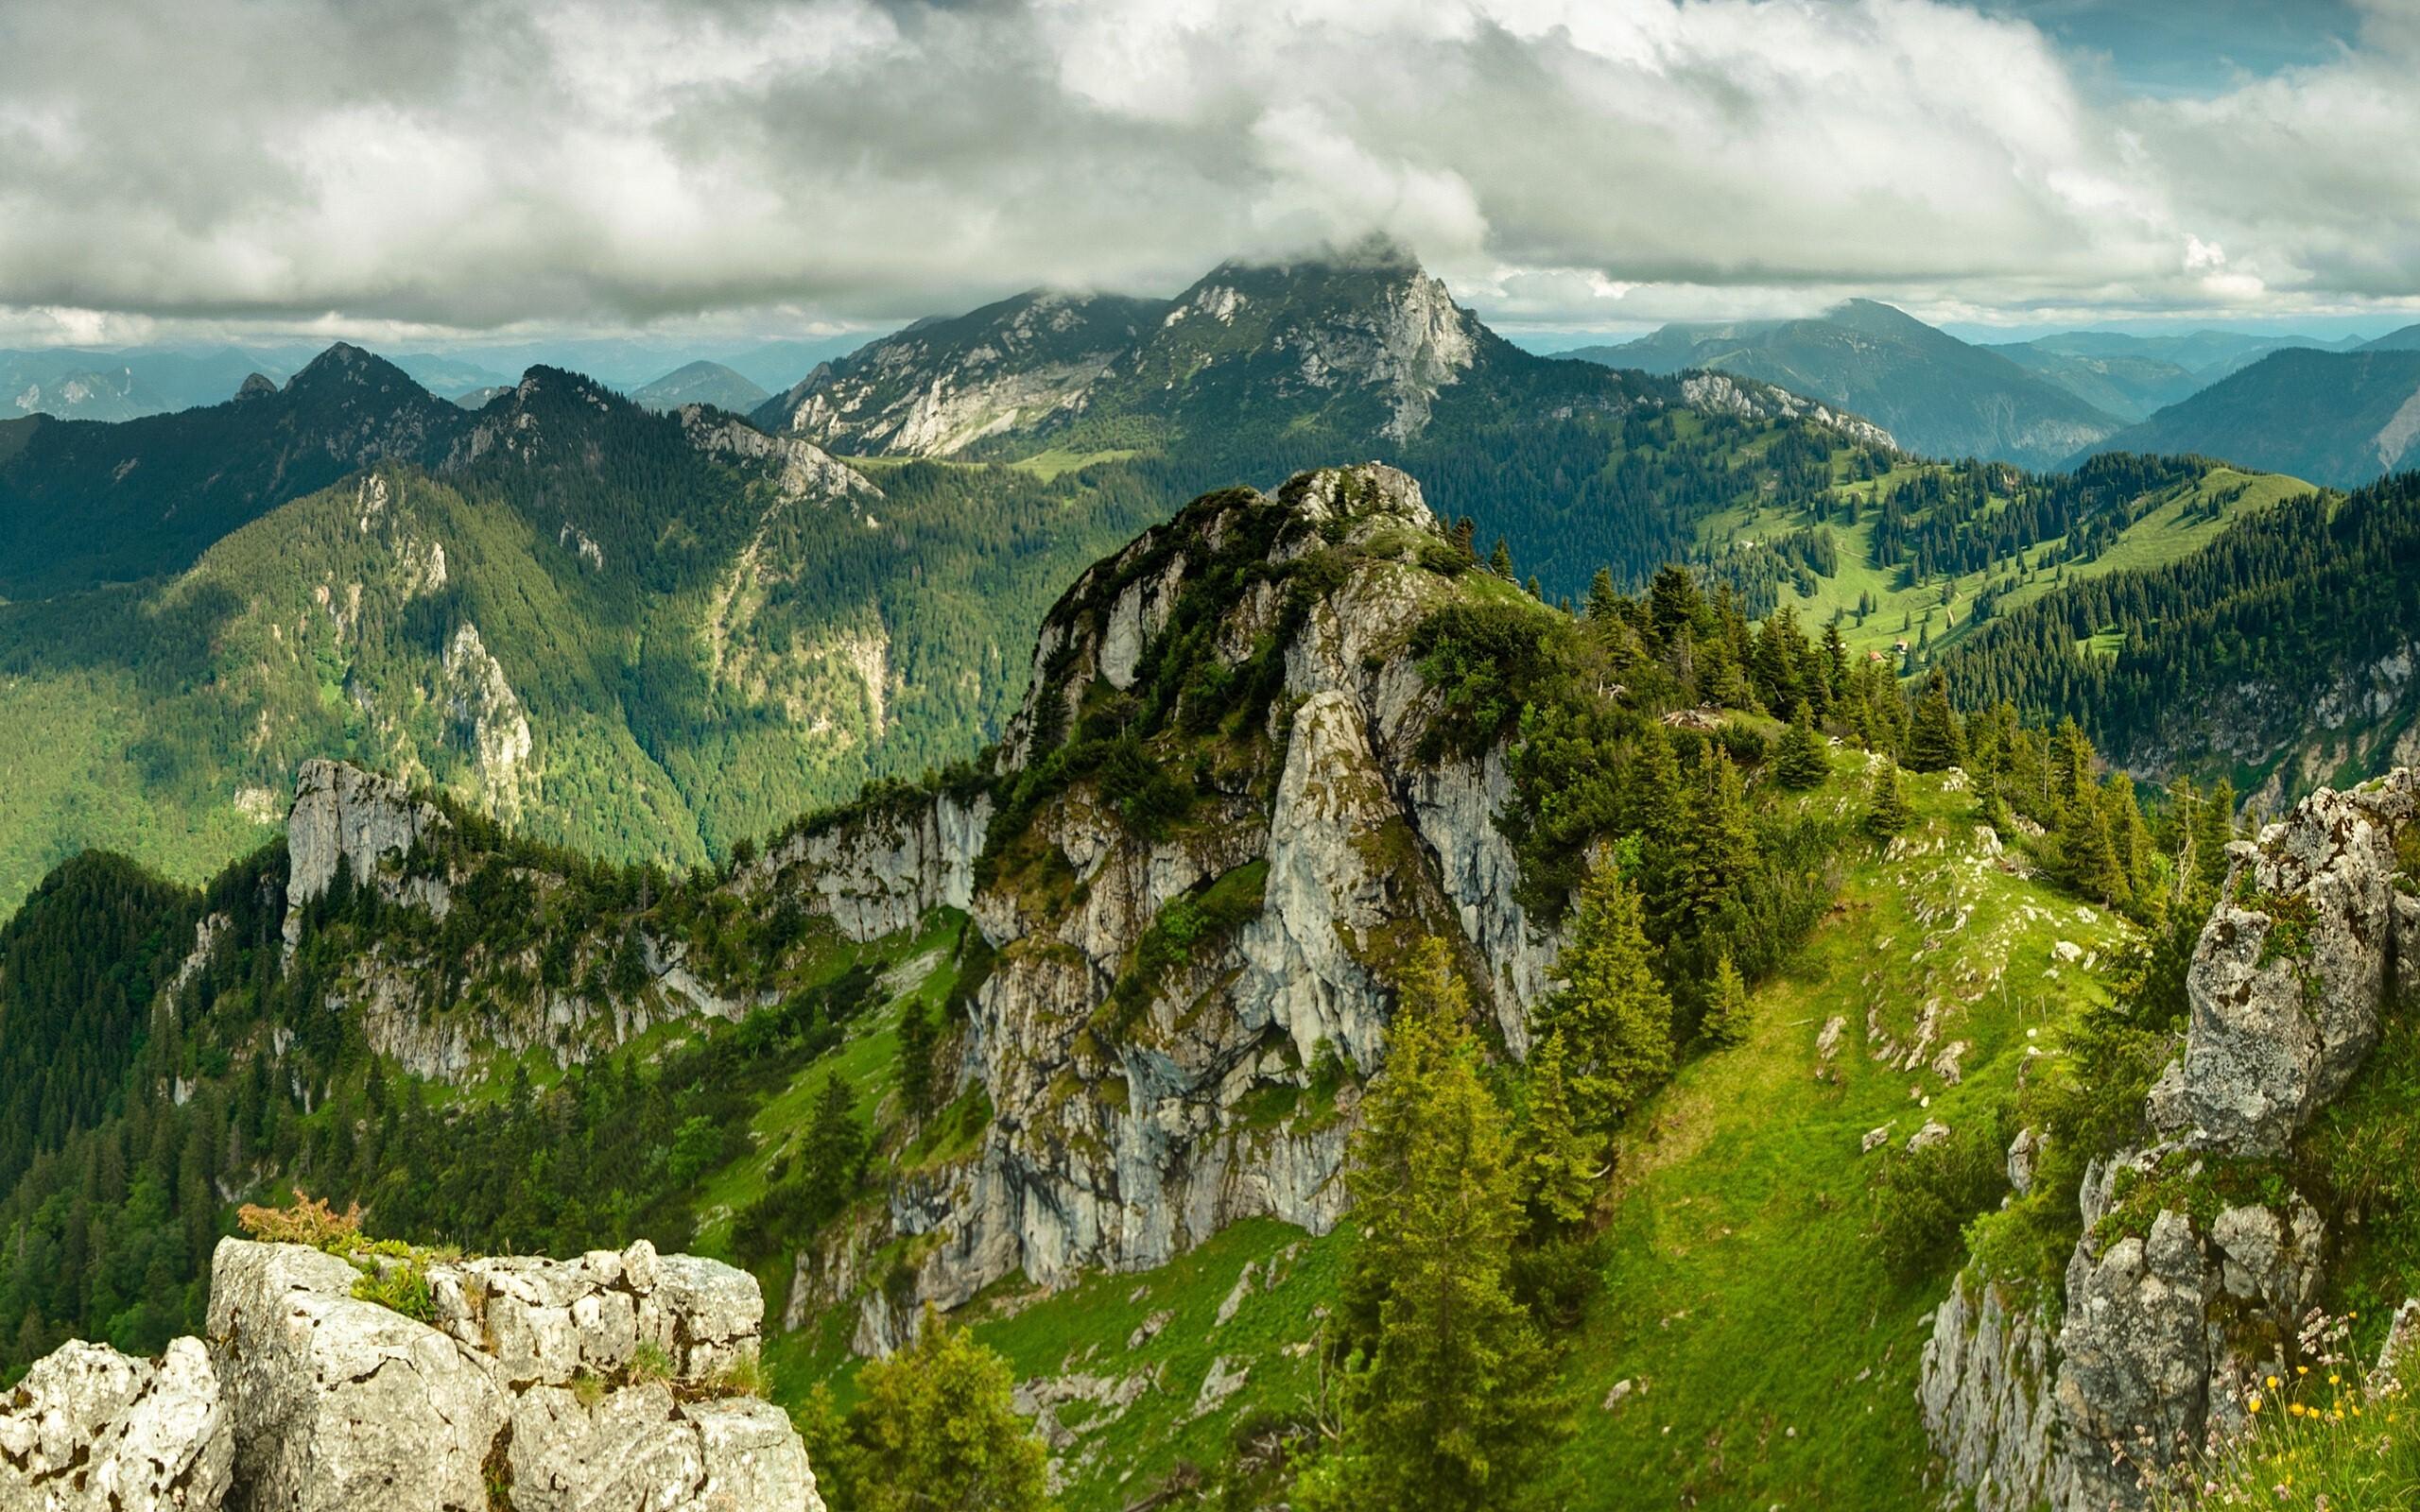 Beautiful Green Mountain Nature Photo Background Hd Wallpapers